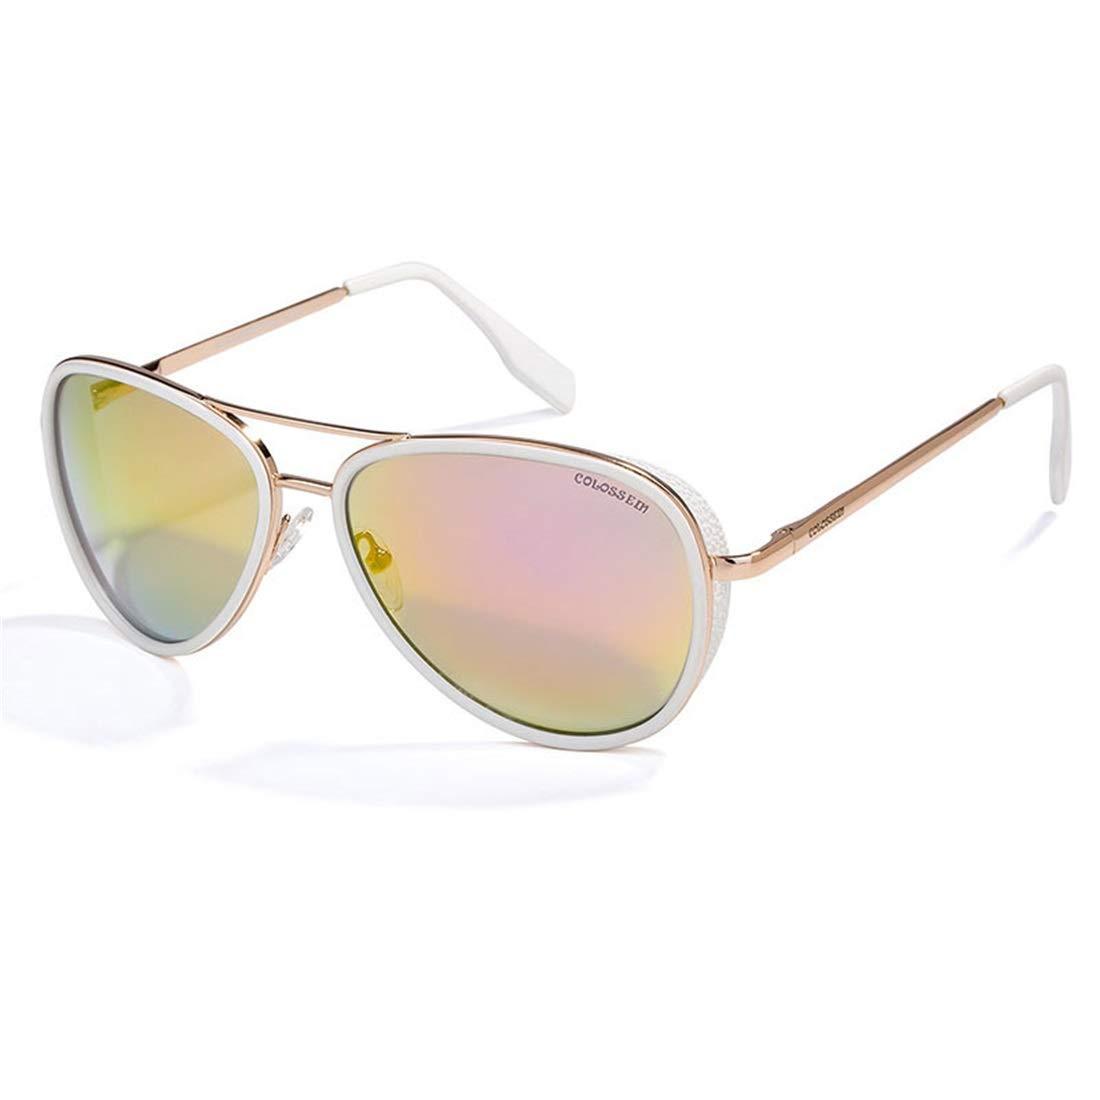 Amazon.com: CHICLI Pilot Sunglasses Women Vintage Coating ...